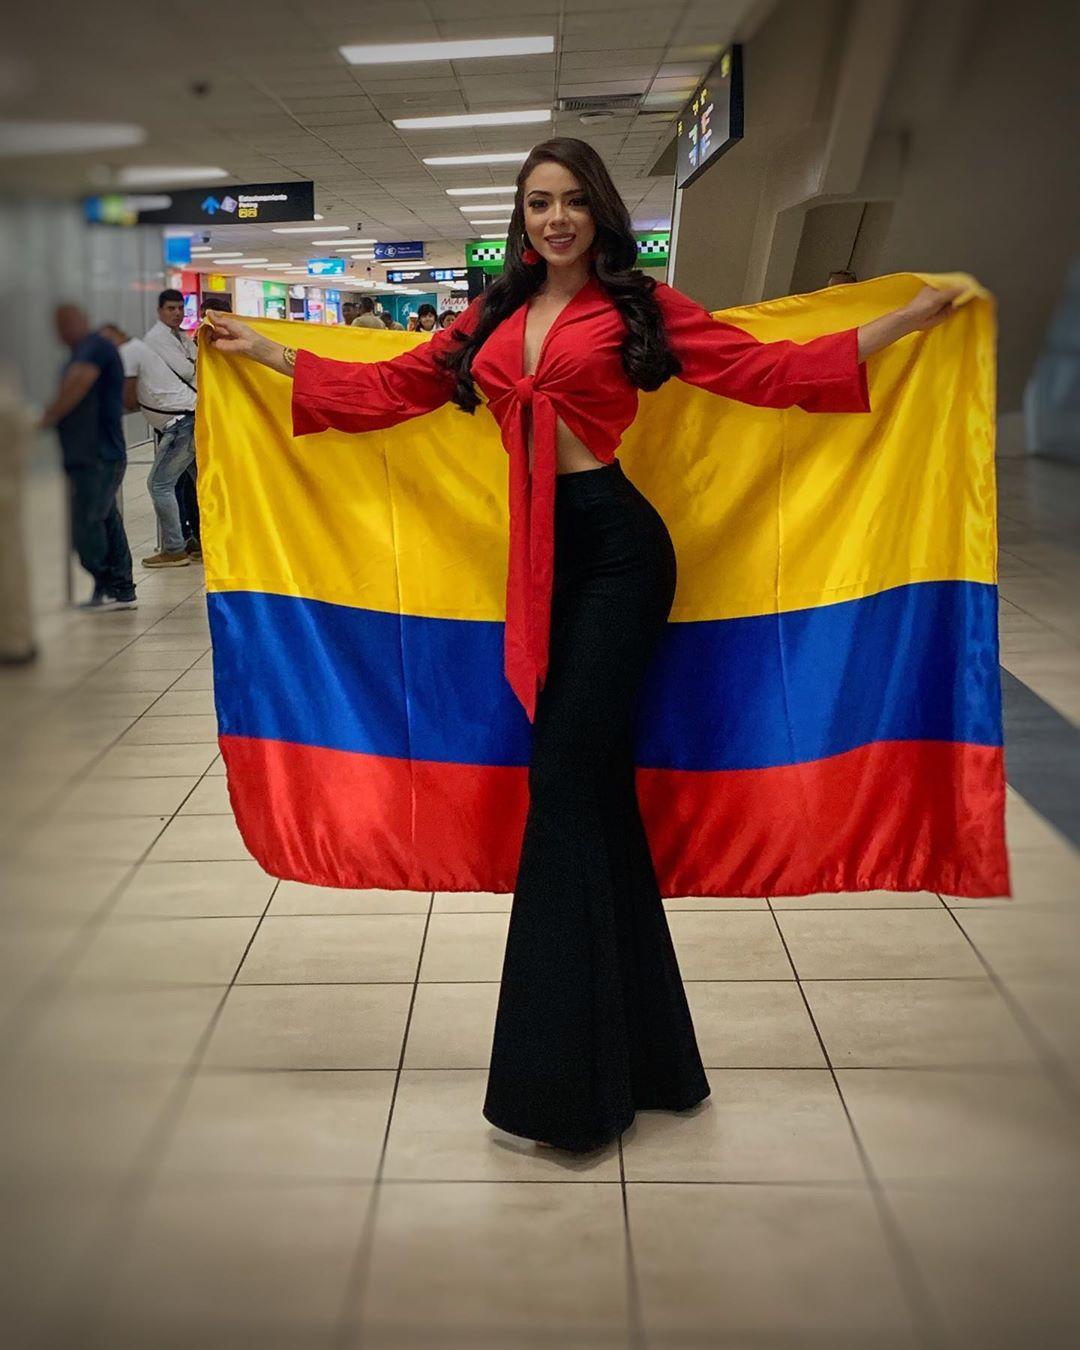 gina aguirre, virreyna de miss latinoamerica 2019. - Página 4 69781910